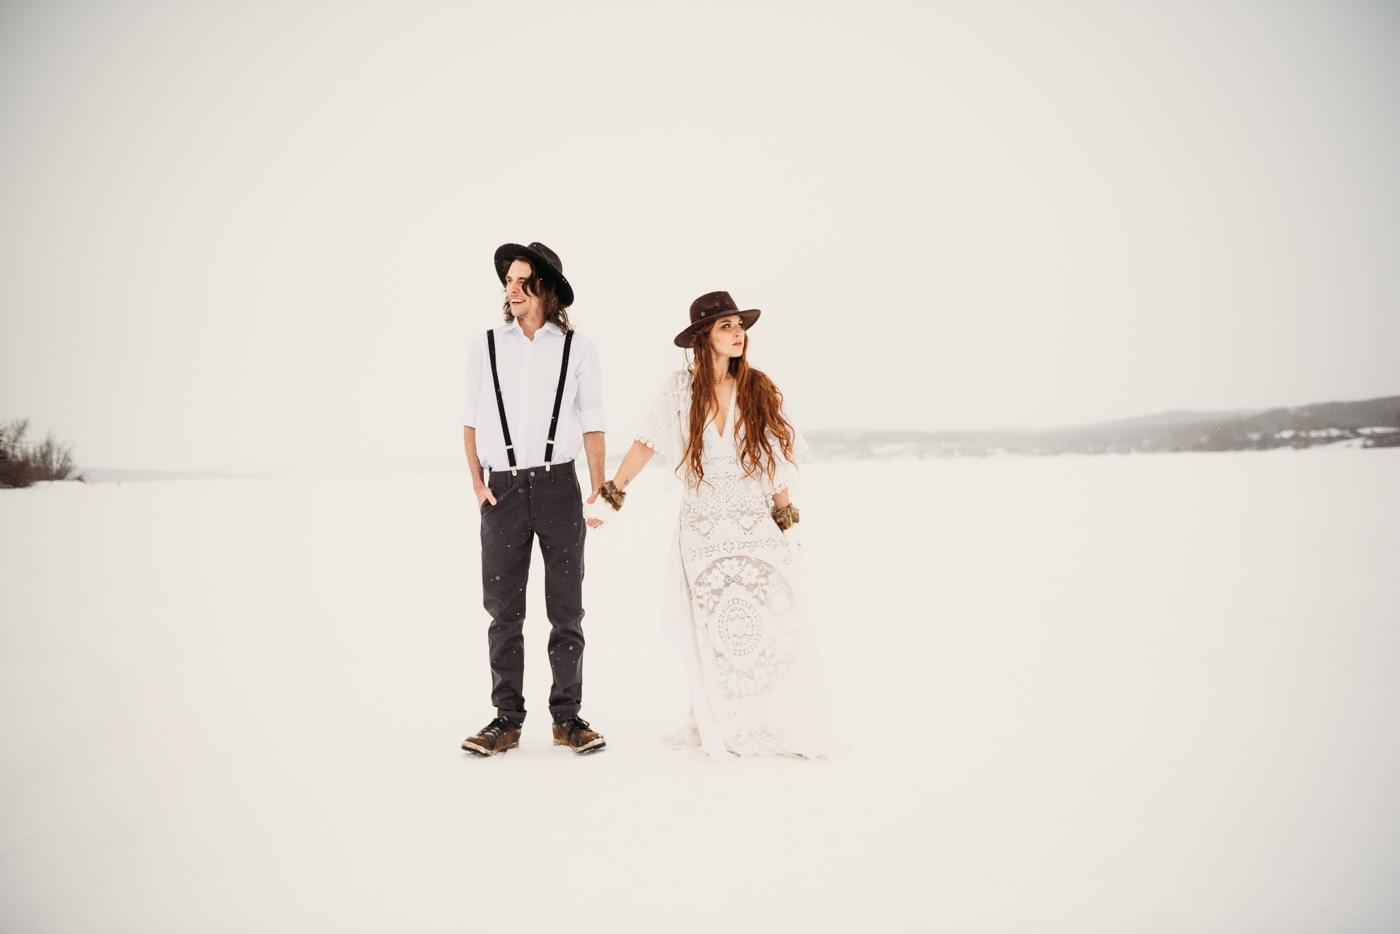 FortSt.John_photographer_TyraEPhotography_Wedding_Couple_Family_Photograhy_DawsonCreek_Elopement_Bride_Boduoir_Portraits-5001.jpg